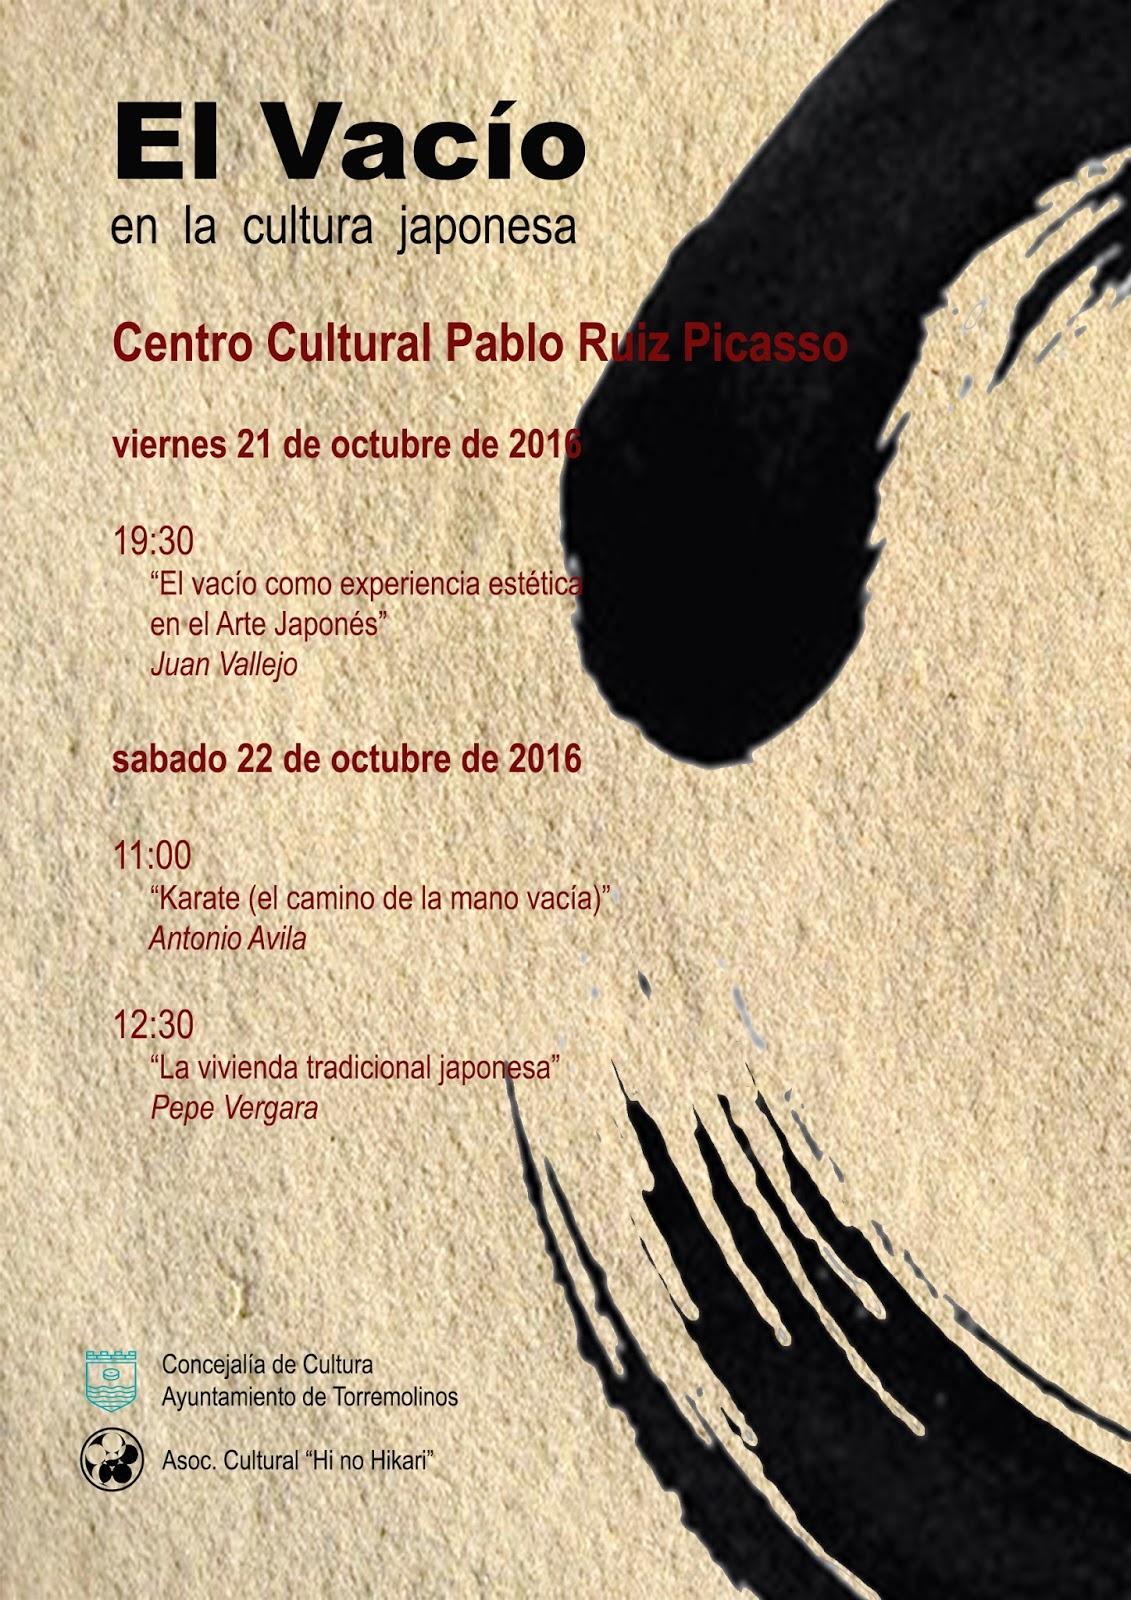 Gimnasio 88 Torreones Avila Of Amako Octubre 2016